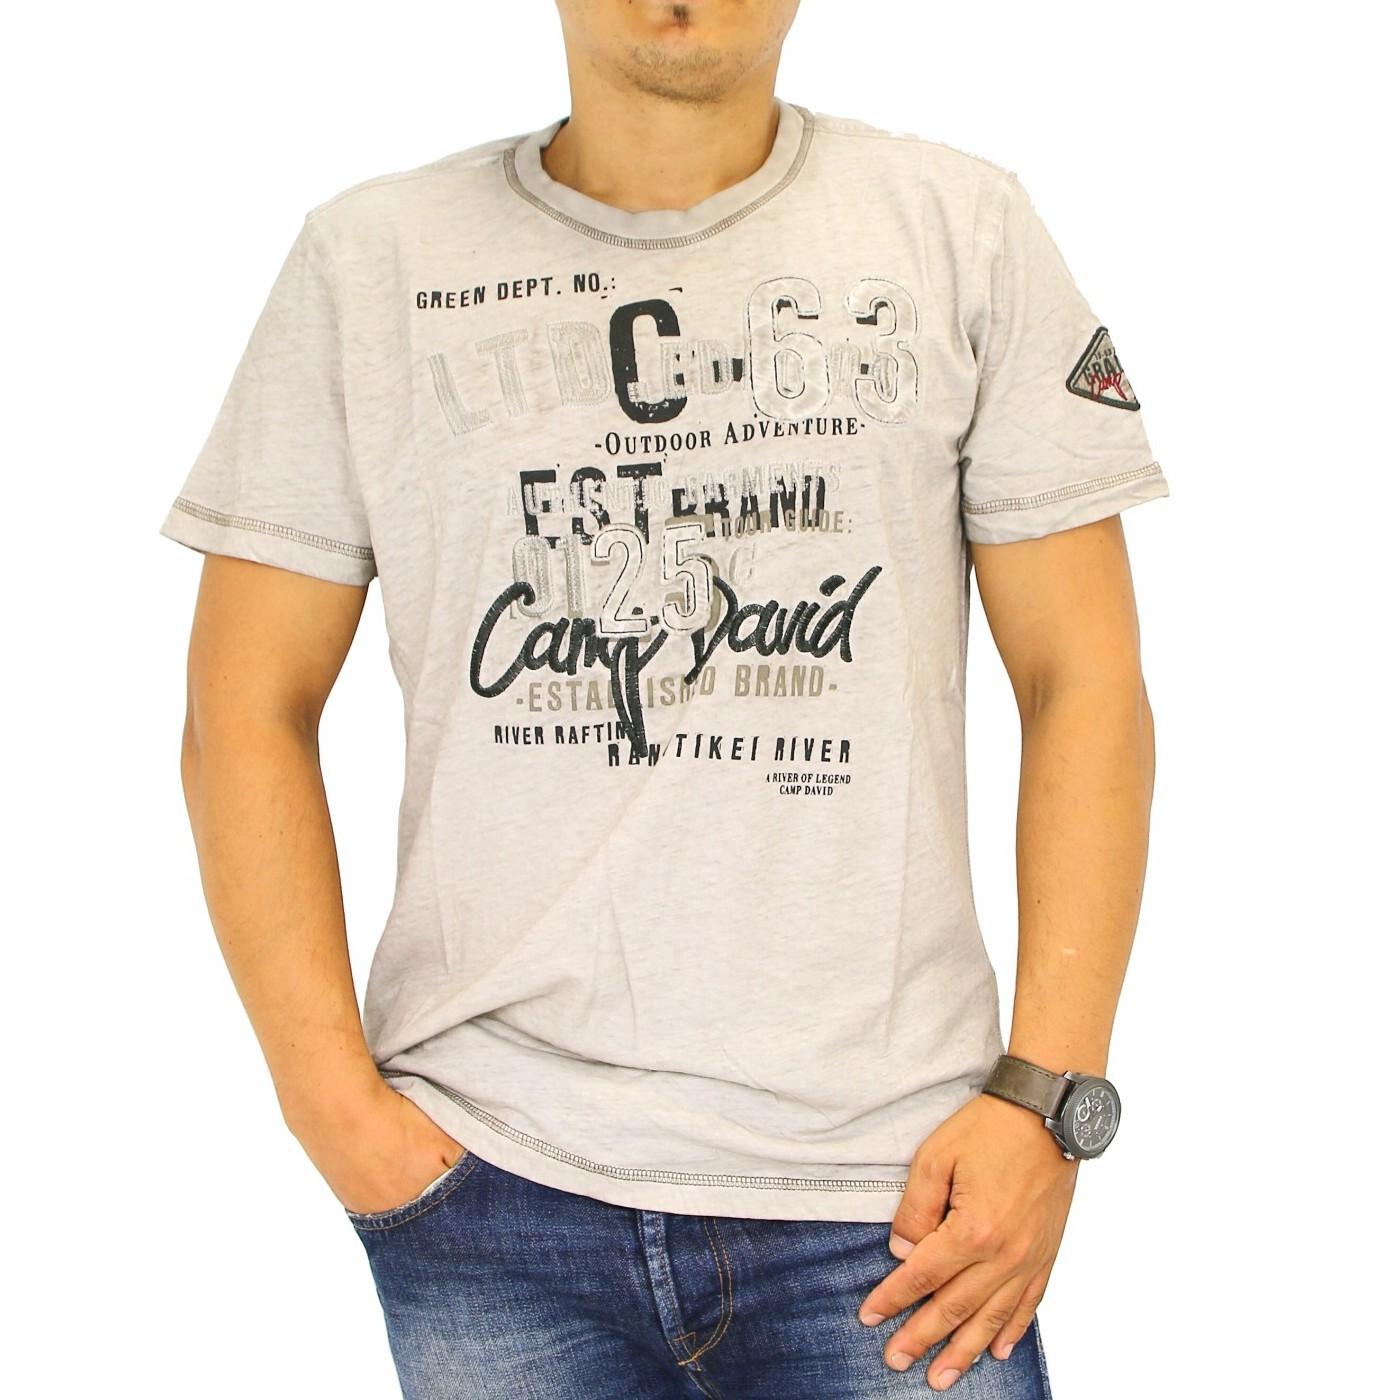 camp david river rafting cd 1 2 t shirt kurzarm herren beige shirt m l ebay. Black Bedroom Furniture Sets. Home Design Ideas